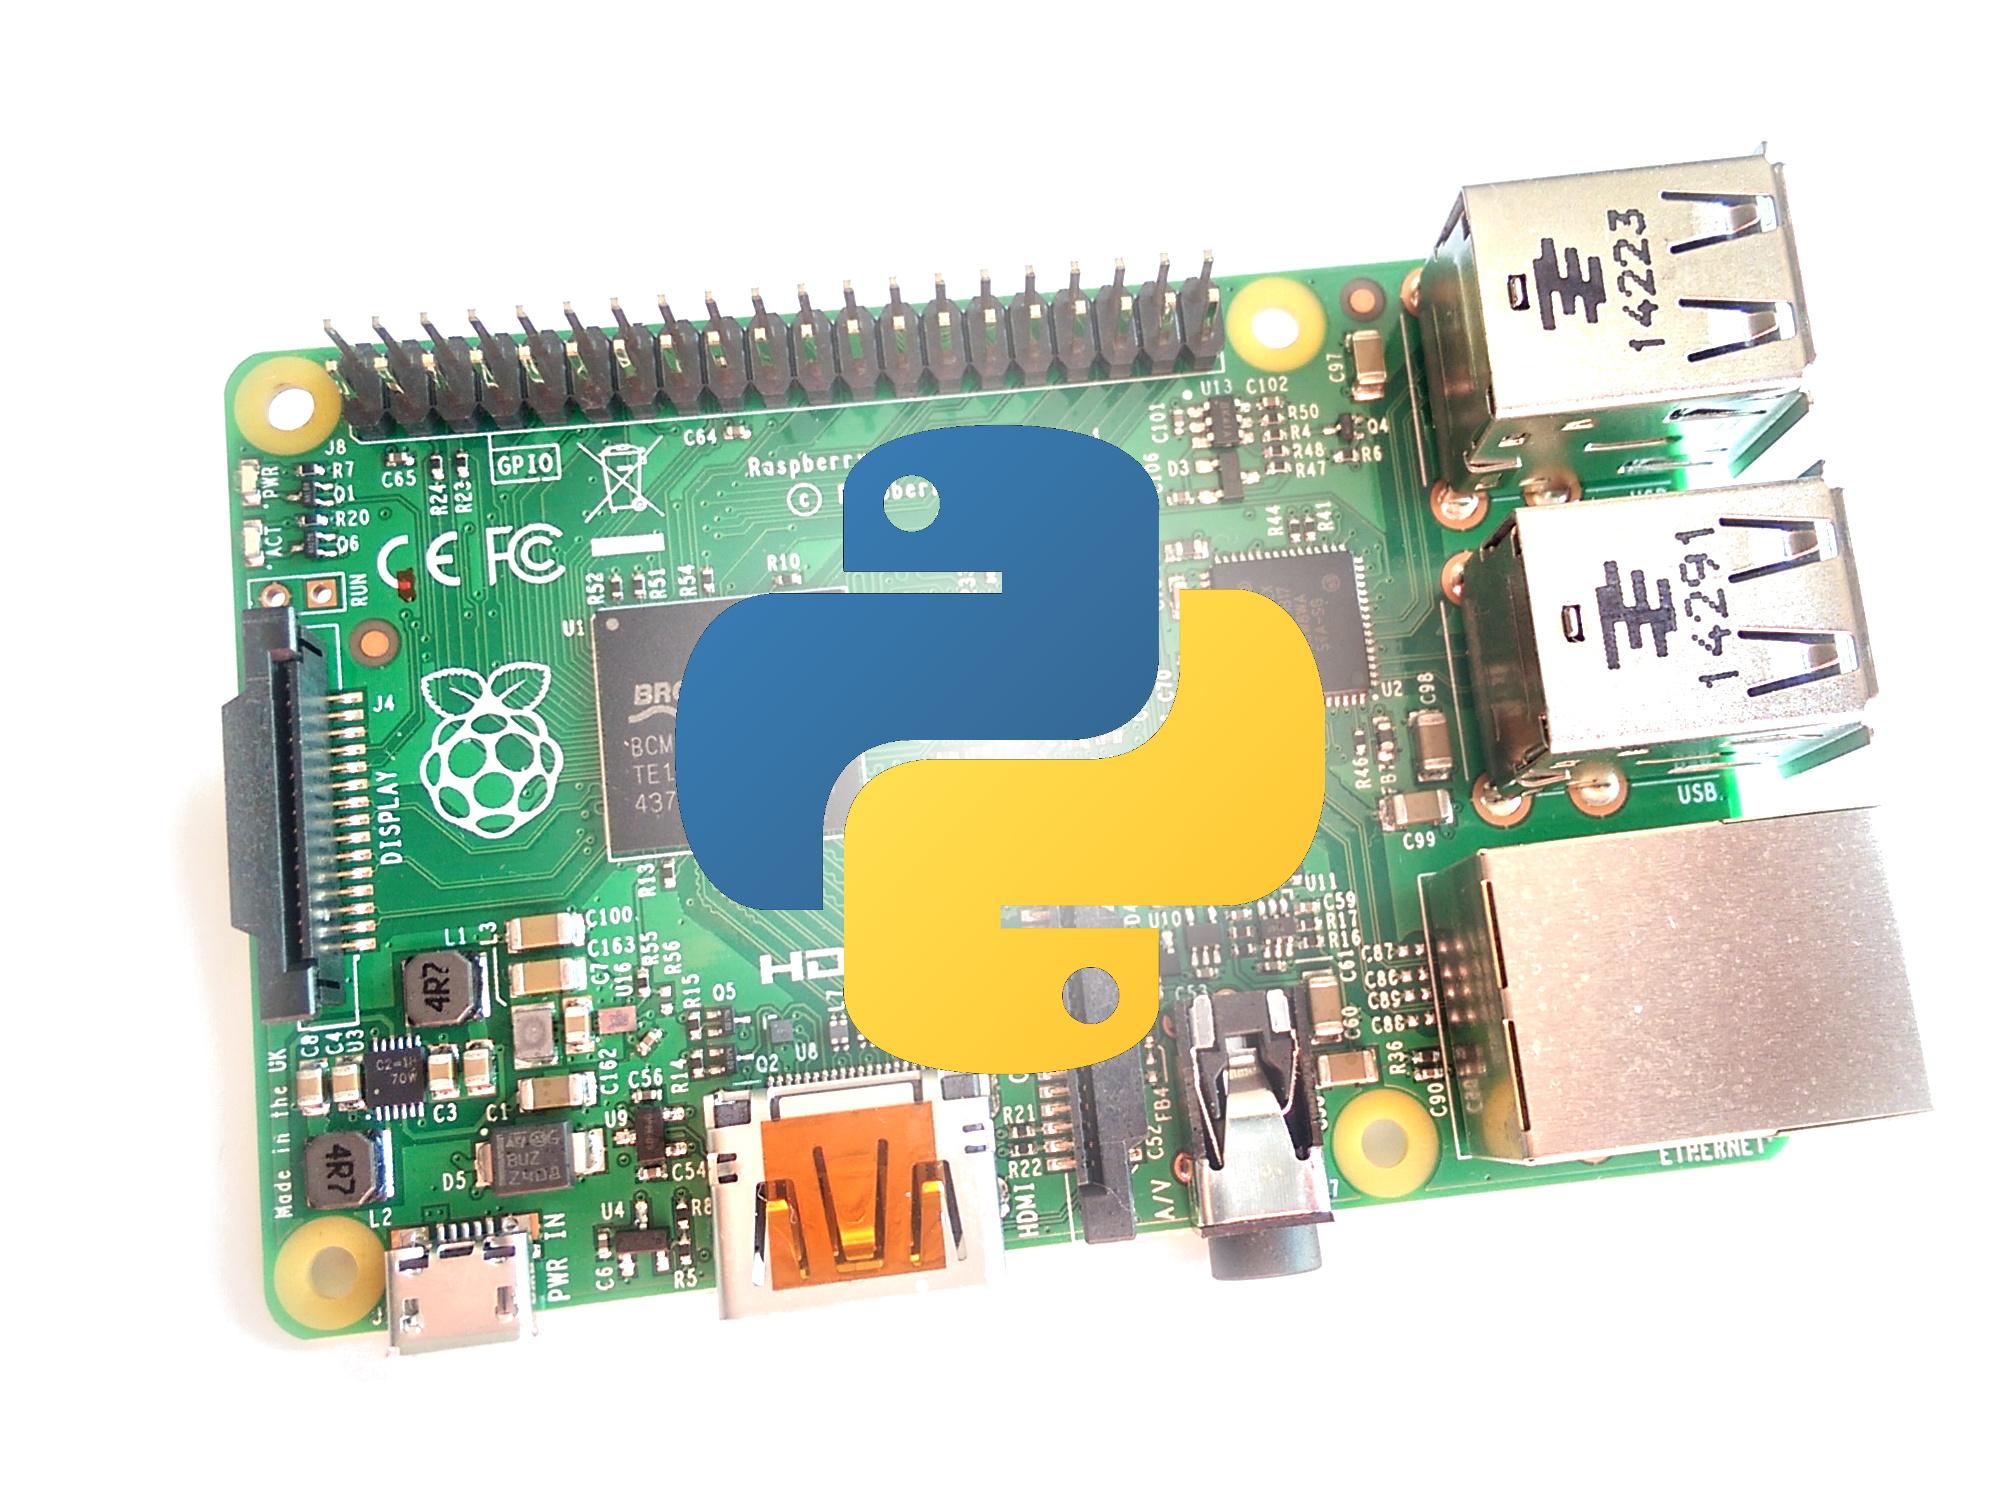 Sending SMS Text Messages Using Python - Raspberry Pi Spy